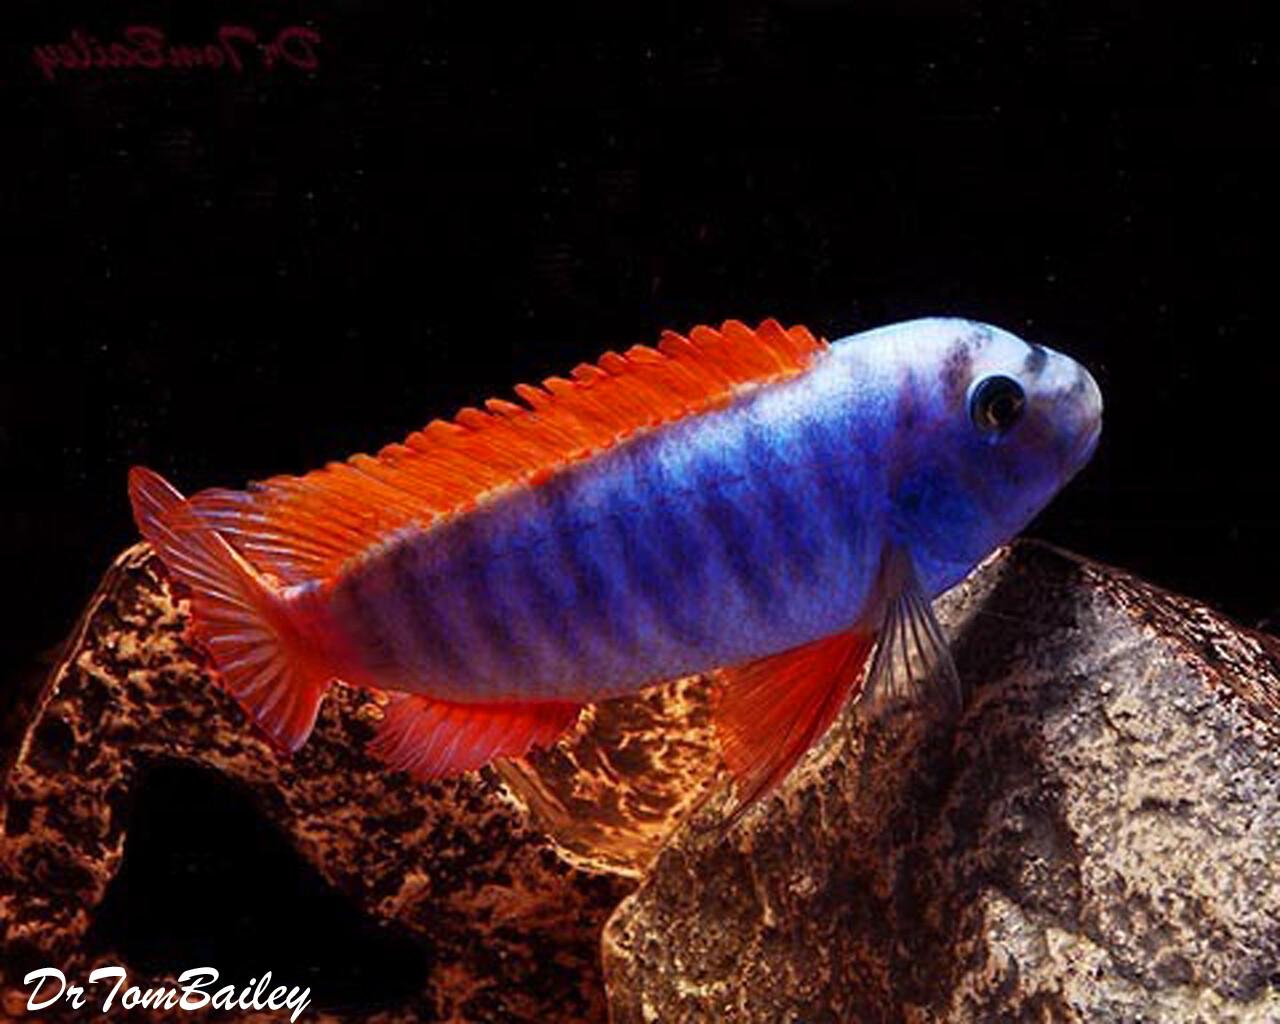 "Premium Labeotropheus Trewavasae Mbuna Cichlid from Lake Malawi, Size: 2"" to 2.5"""